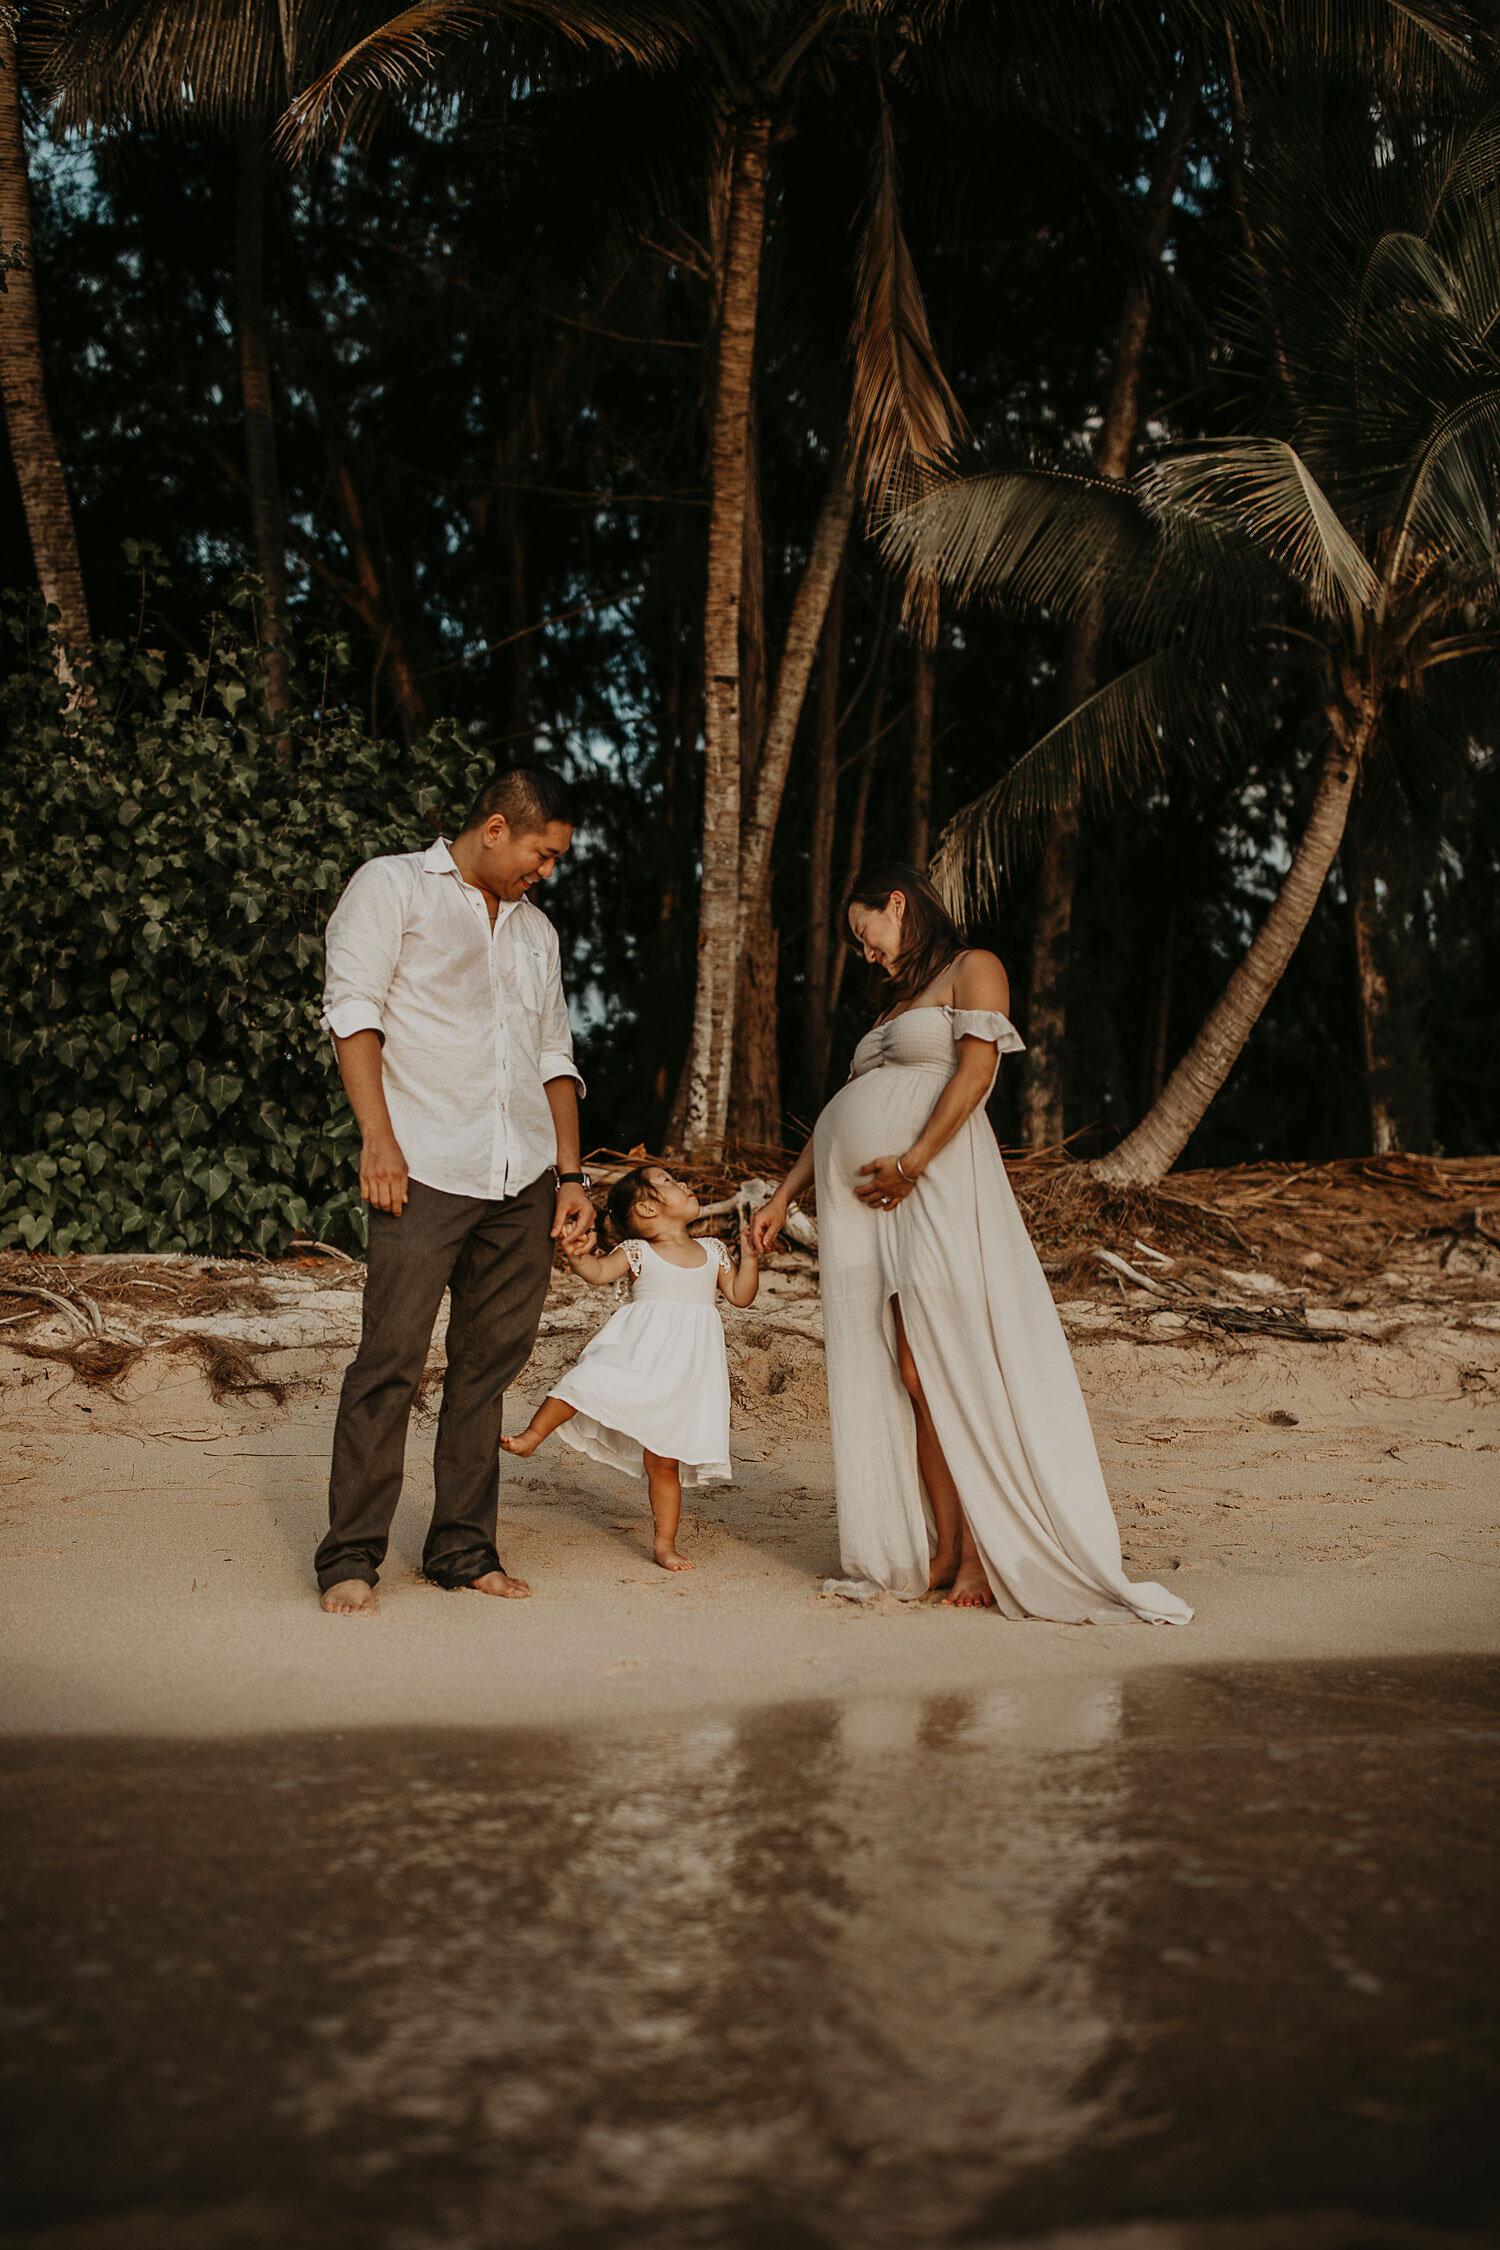 Oahu-Hawaii-North-Shore-Maternity-Photography-The-Sophia-Co-24.jpg